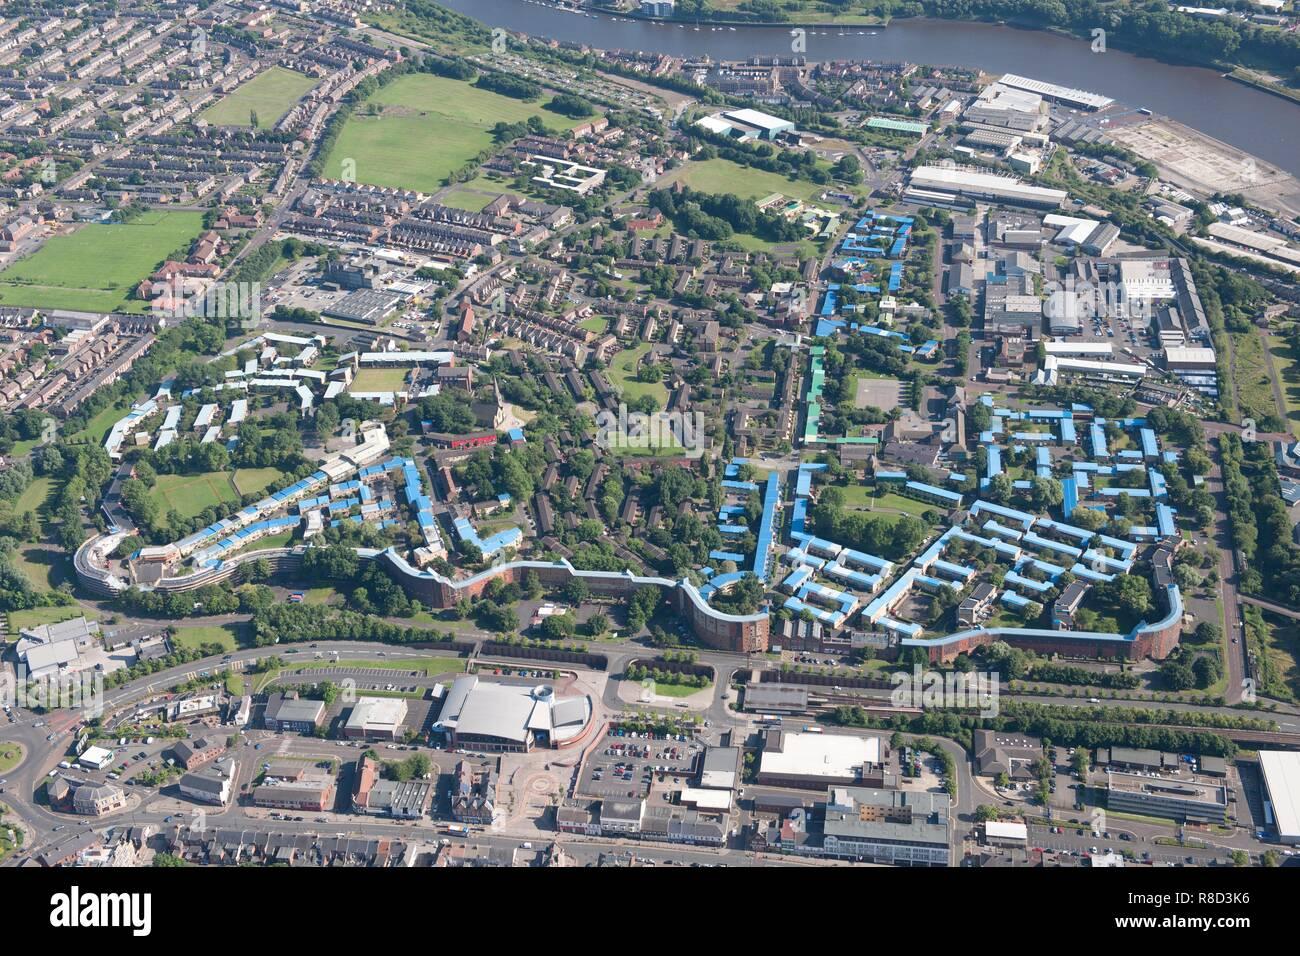 Byker Wall housing estate, Newcastle upon Tyne, 2015. - Stock Image